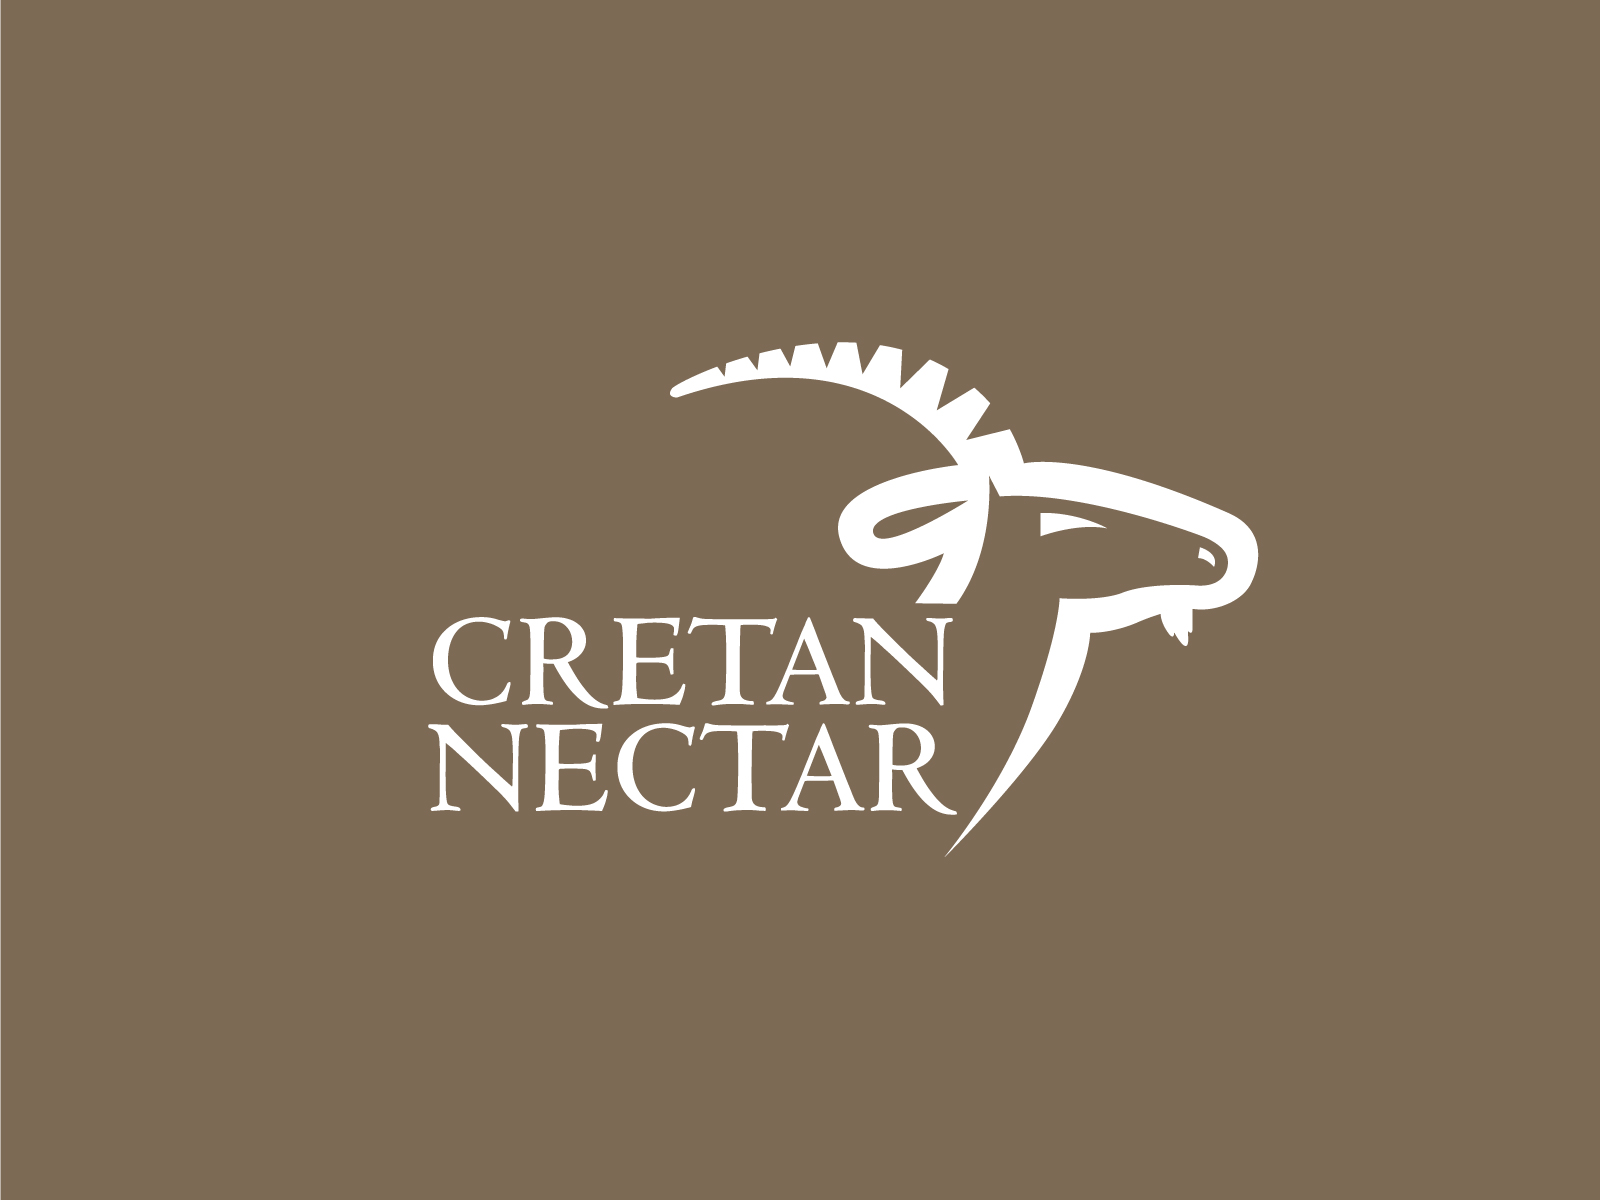 Cretan Nectar